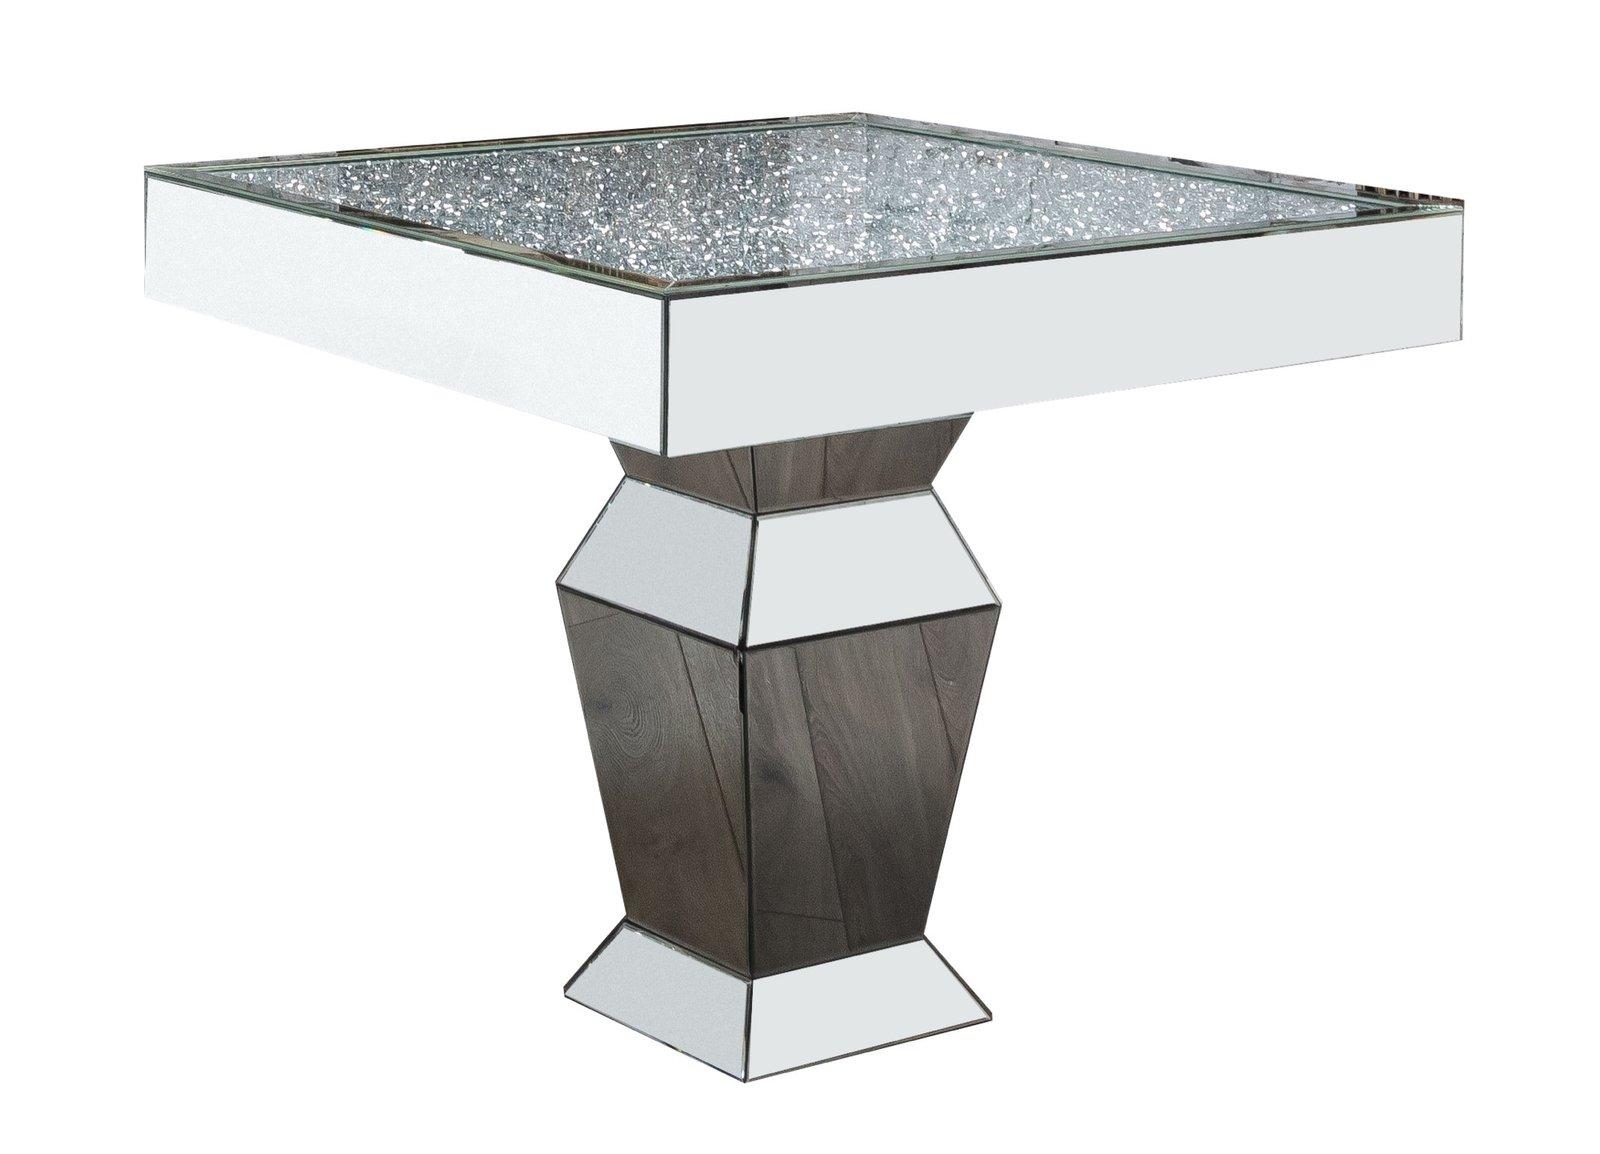 Piata Dining Table